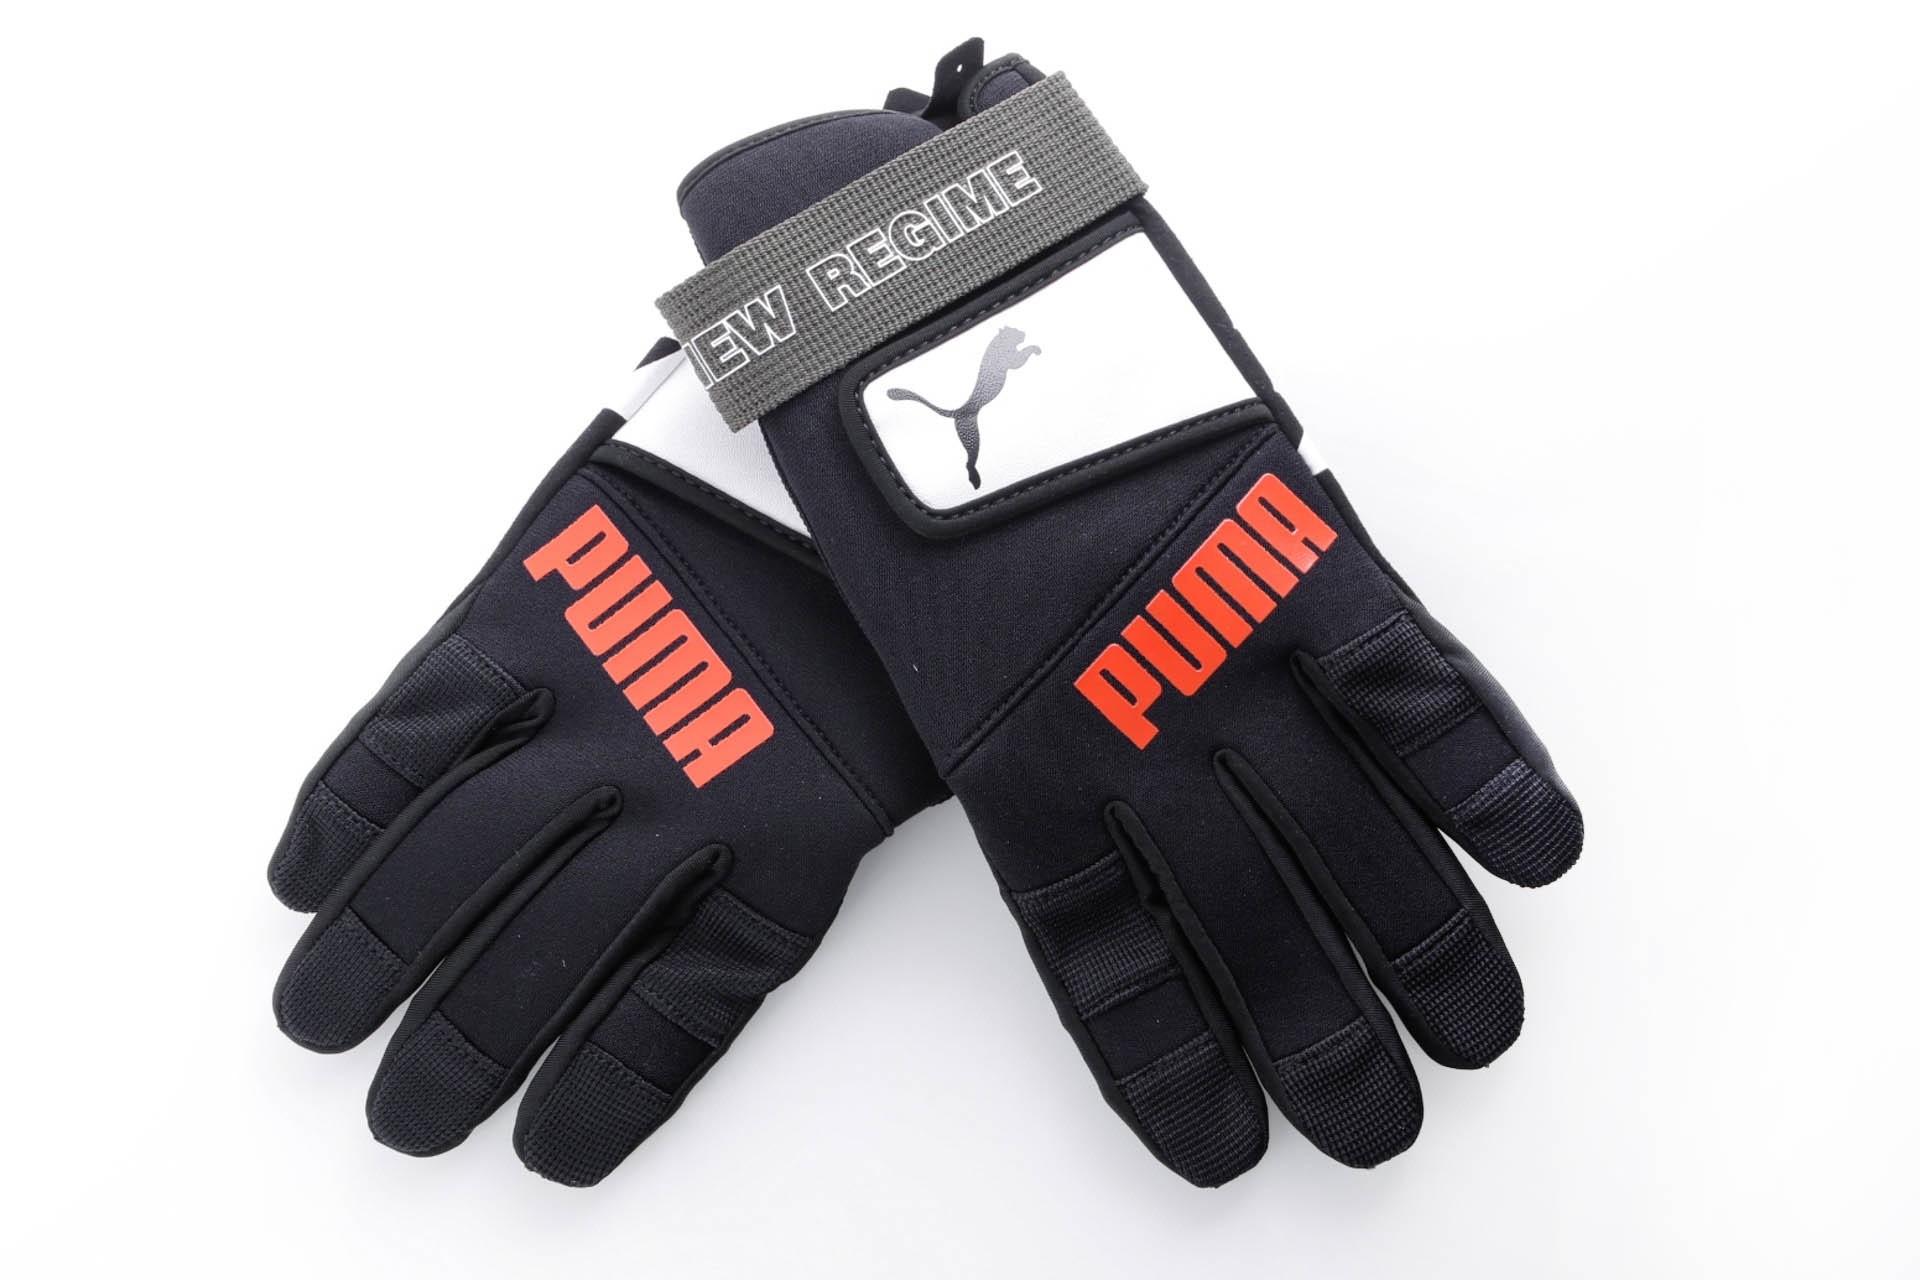 Foto van Puma ANR gloves 41491 Handschoenen Puma Black